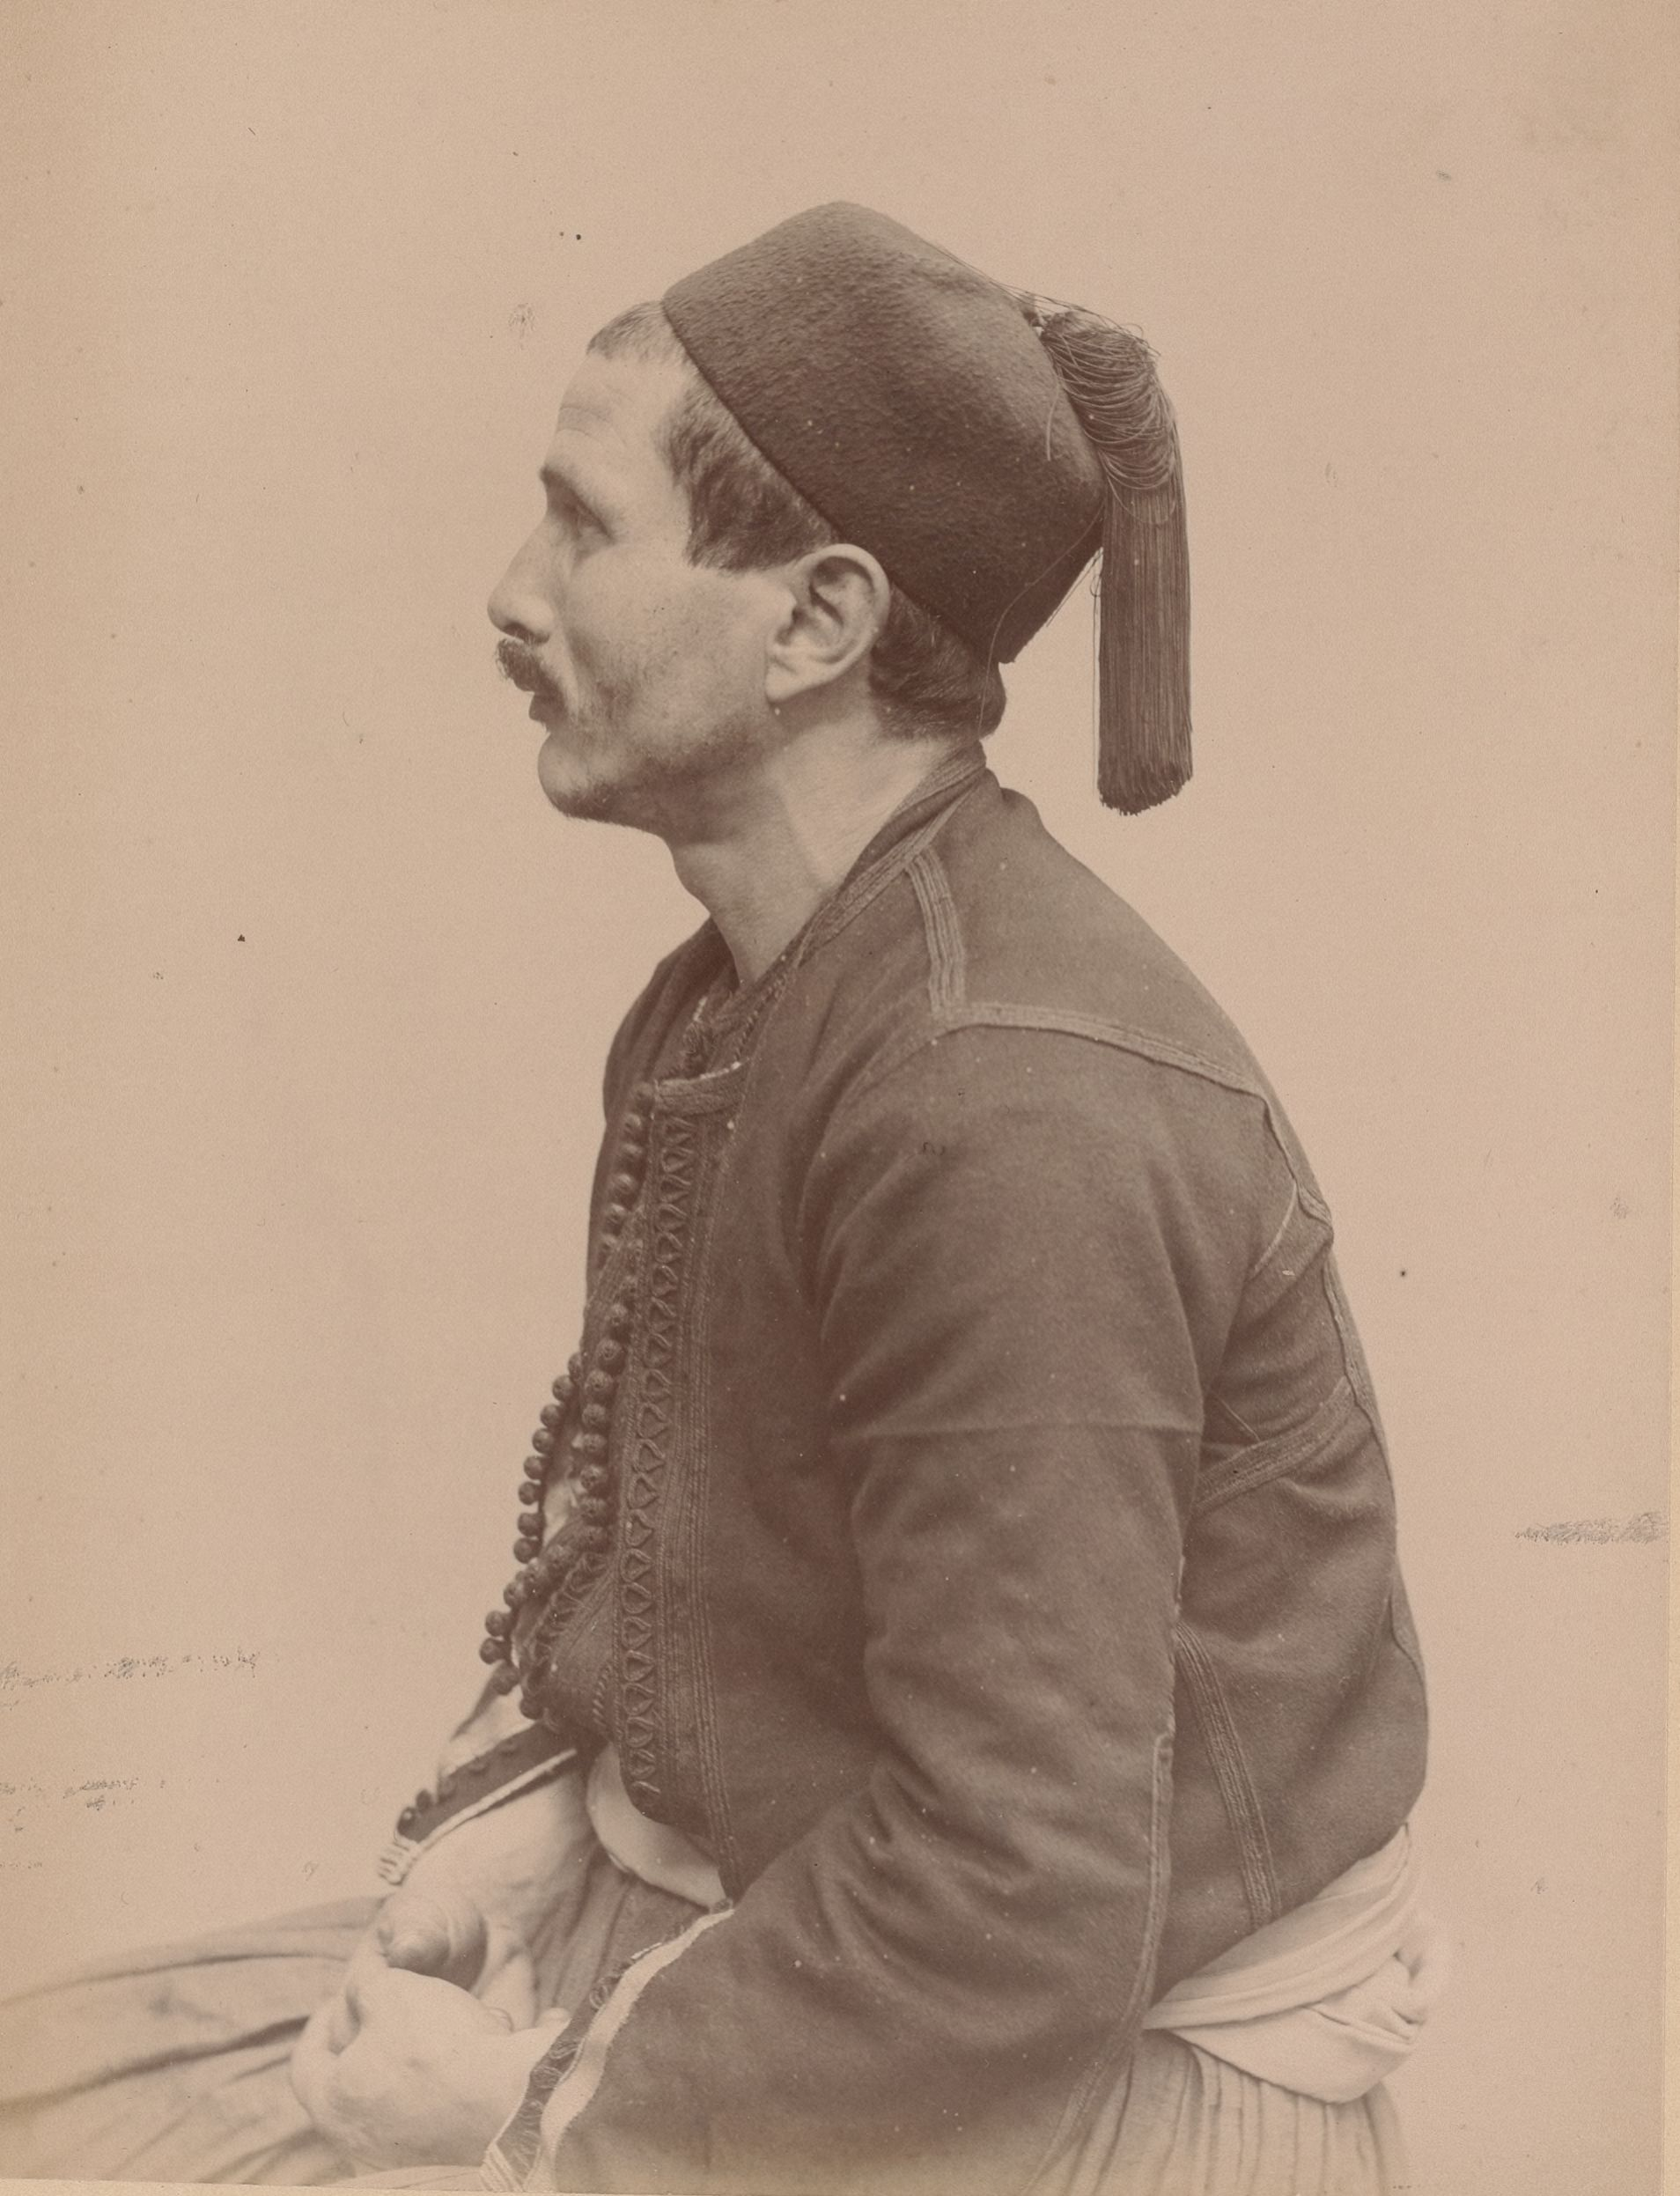 Мохамед, 30, Алжир, Аифсаона, сапожник (вид в профиль)